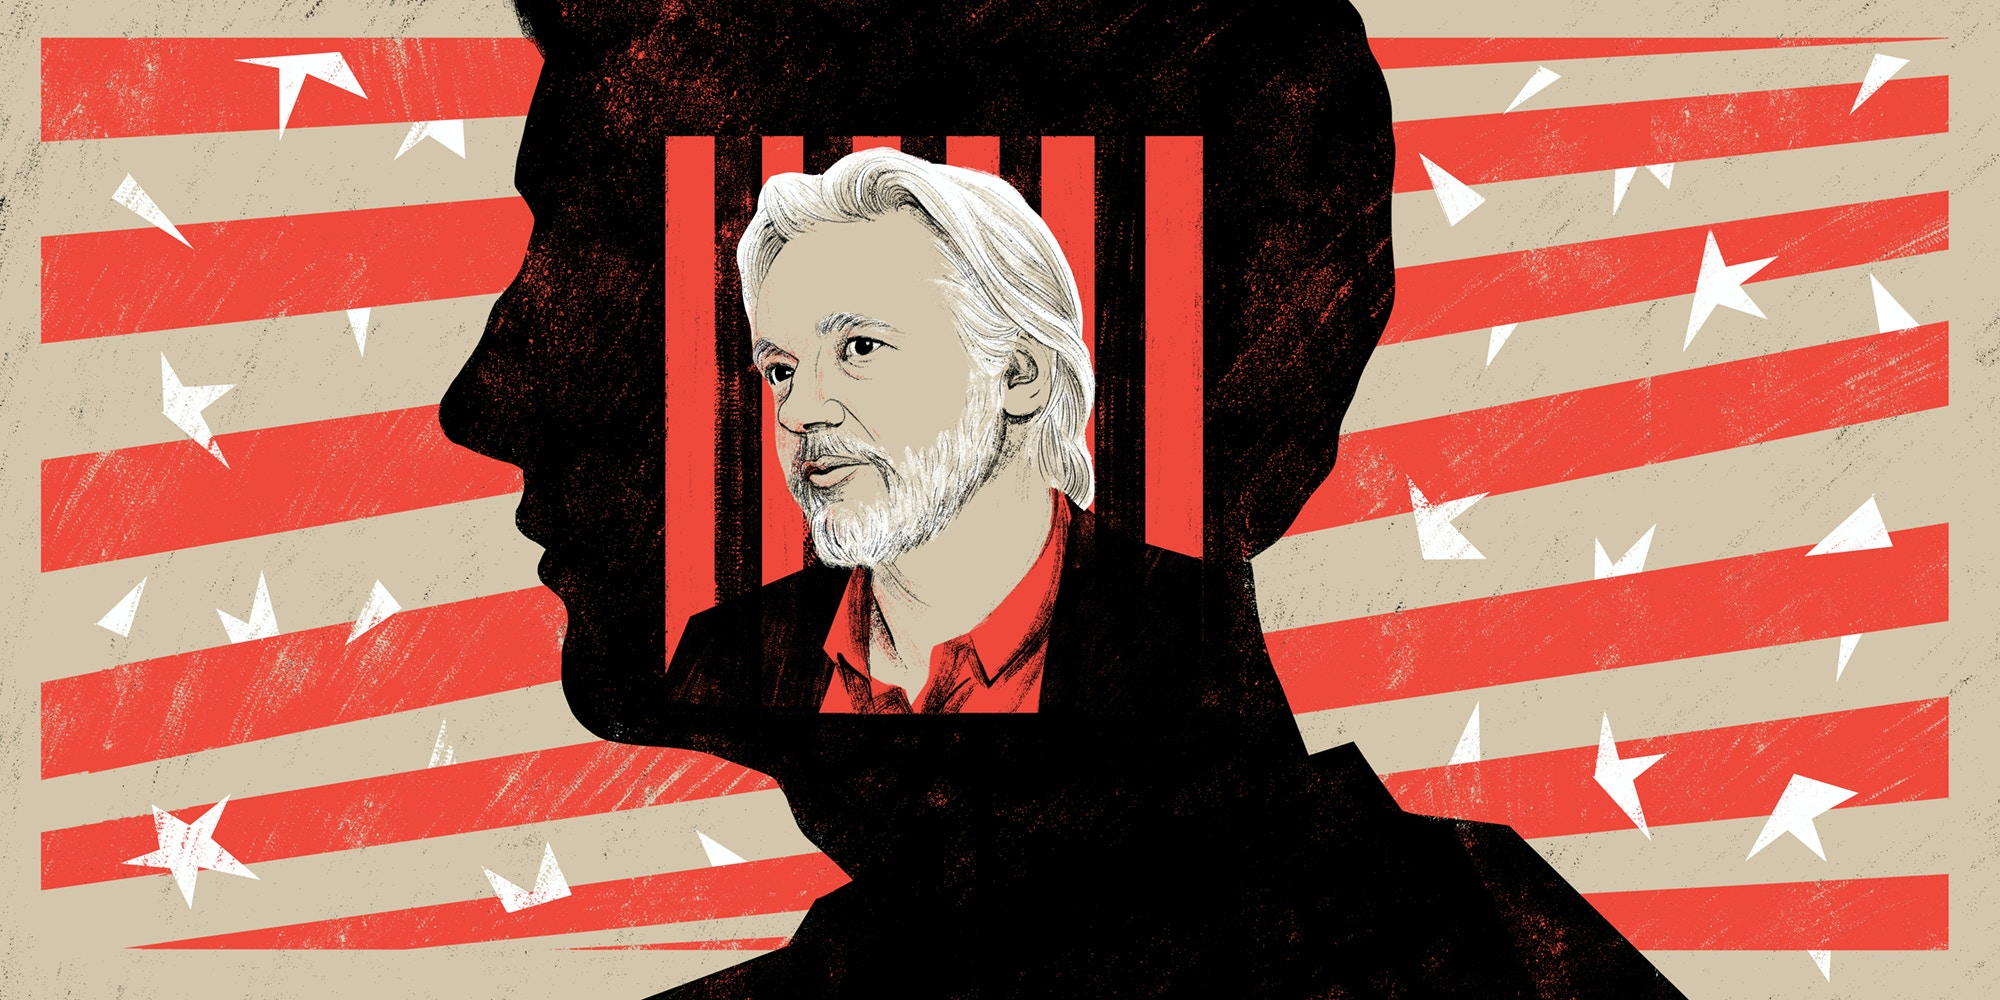 Illustration of Julian Assange